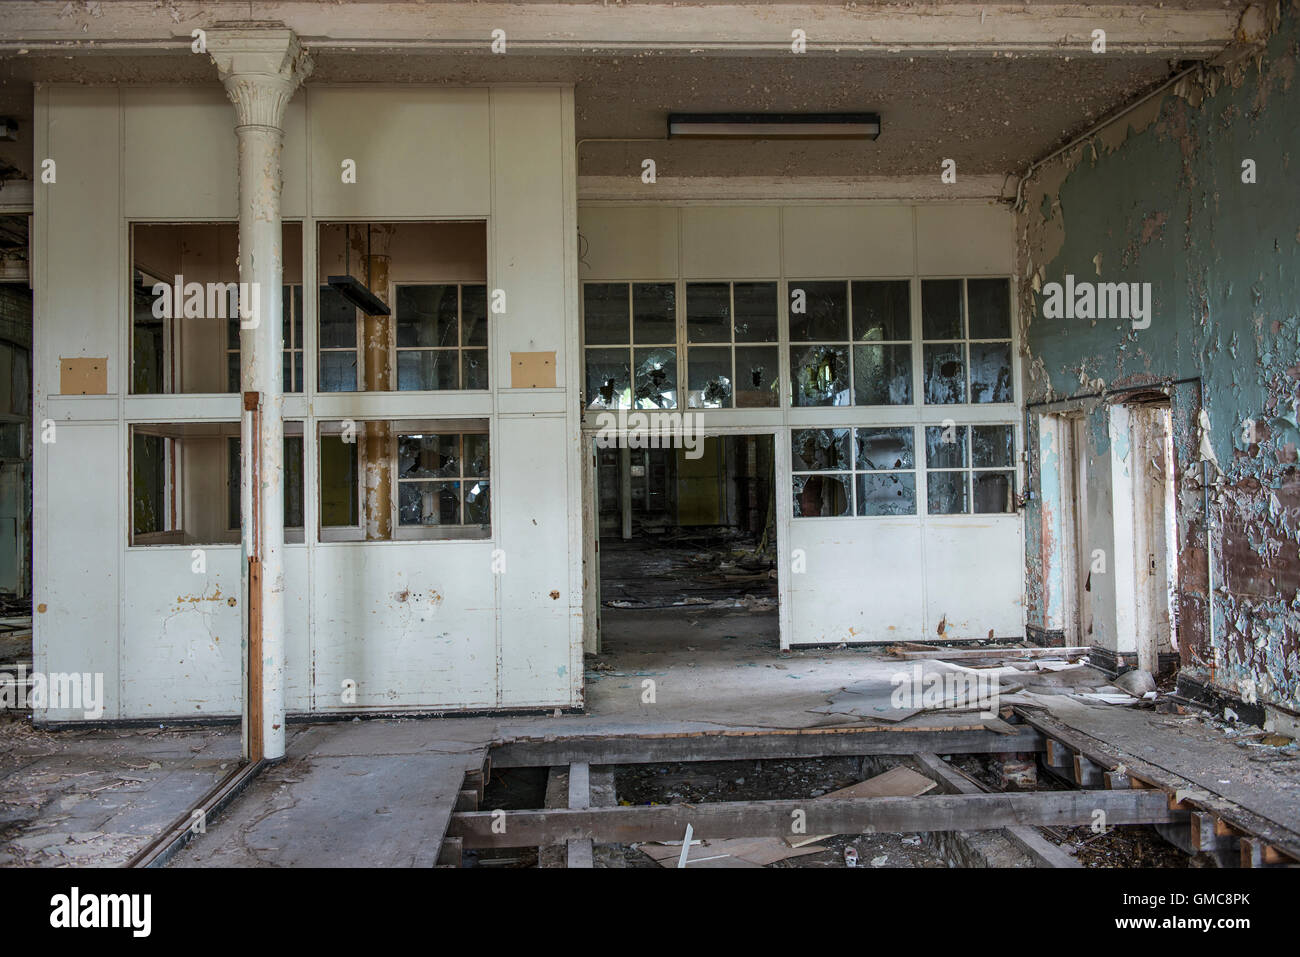 Inside one of the many wards at Denbigh Asylum, Denbigh, Denbighshire, Wales, UK - Stock Image